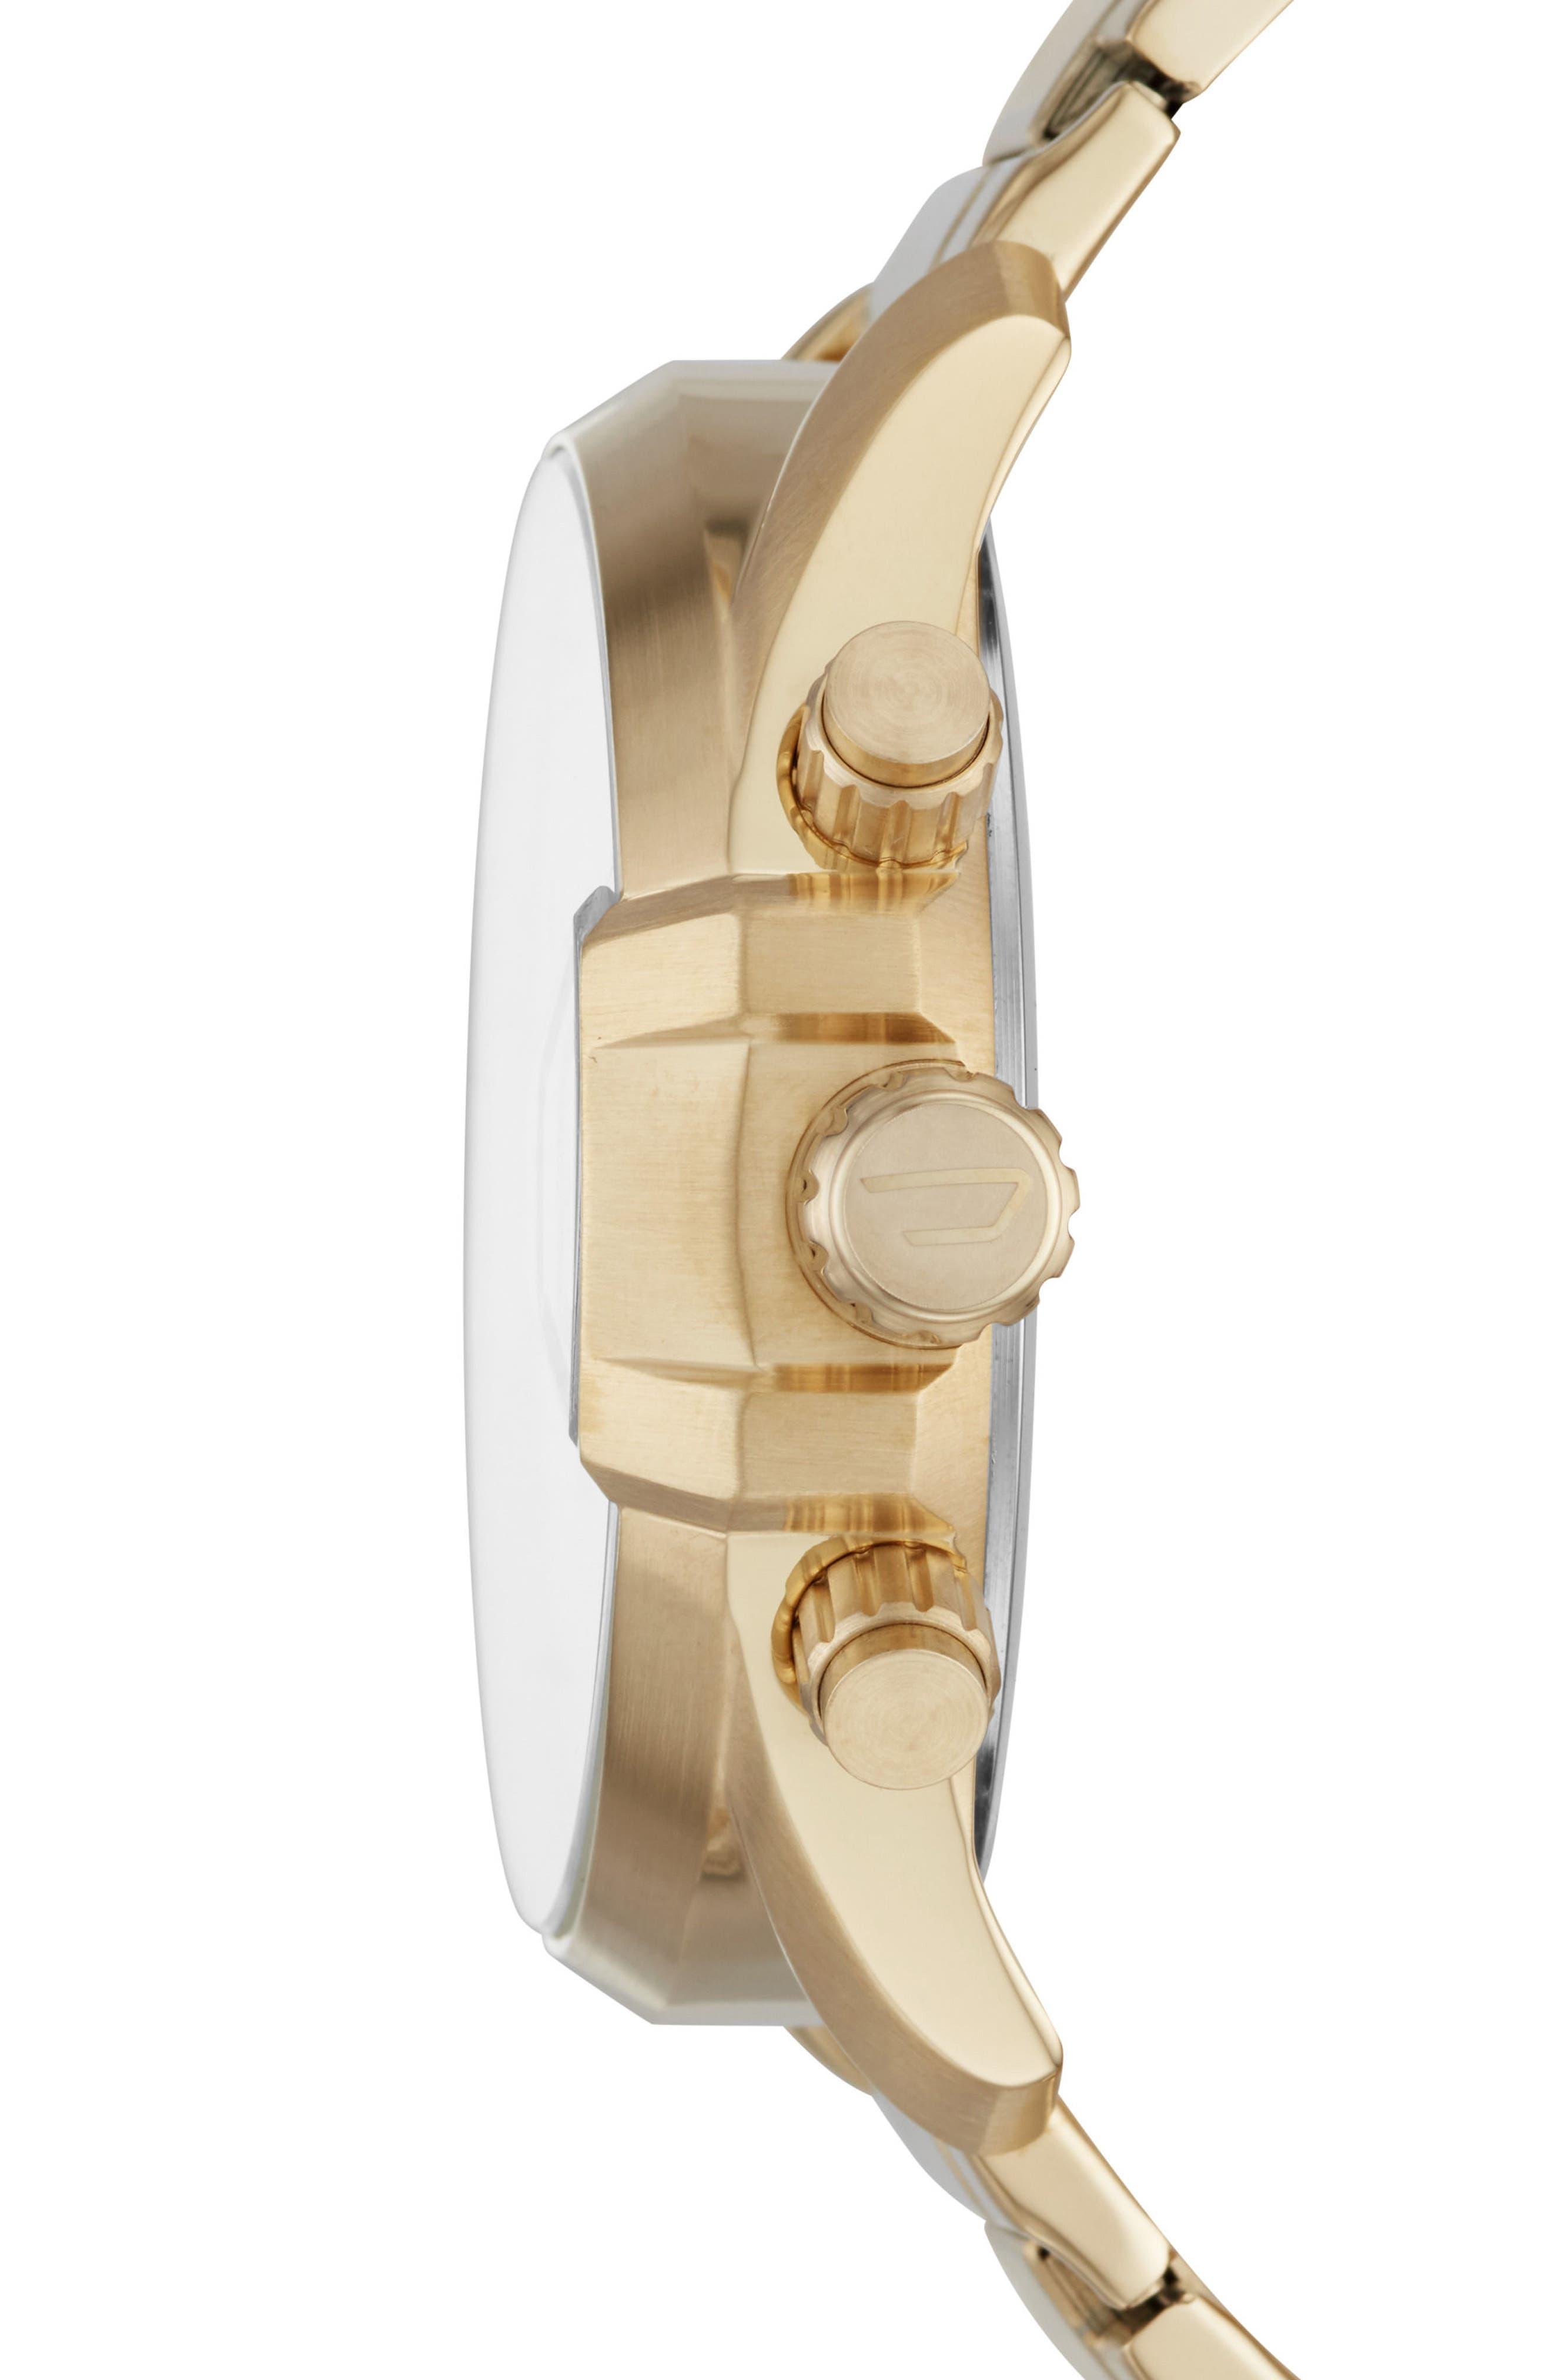 DIESEL<SUP>®</SUP>, MS9 Chronograph Bracelet Watch, 47mm x 54mm, Alternate thumbnail 2, color, 710